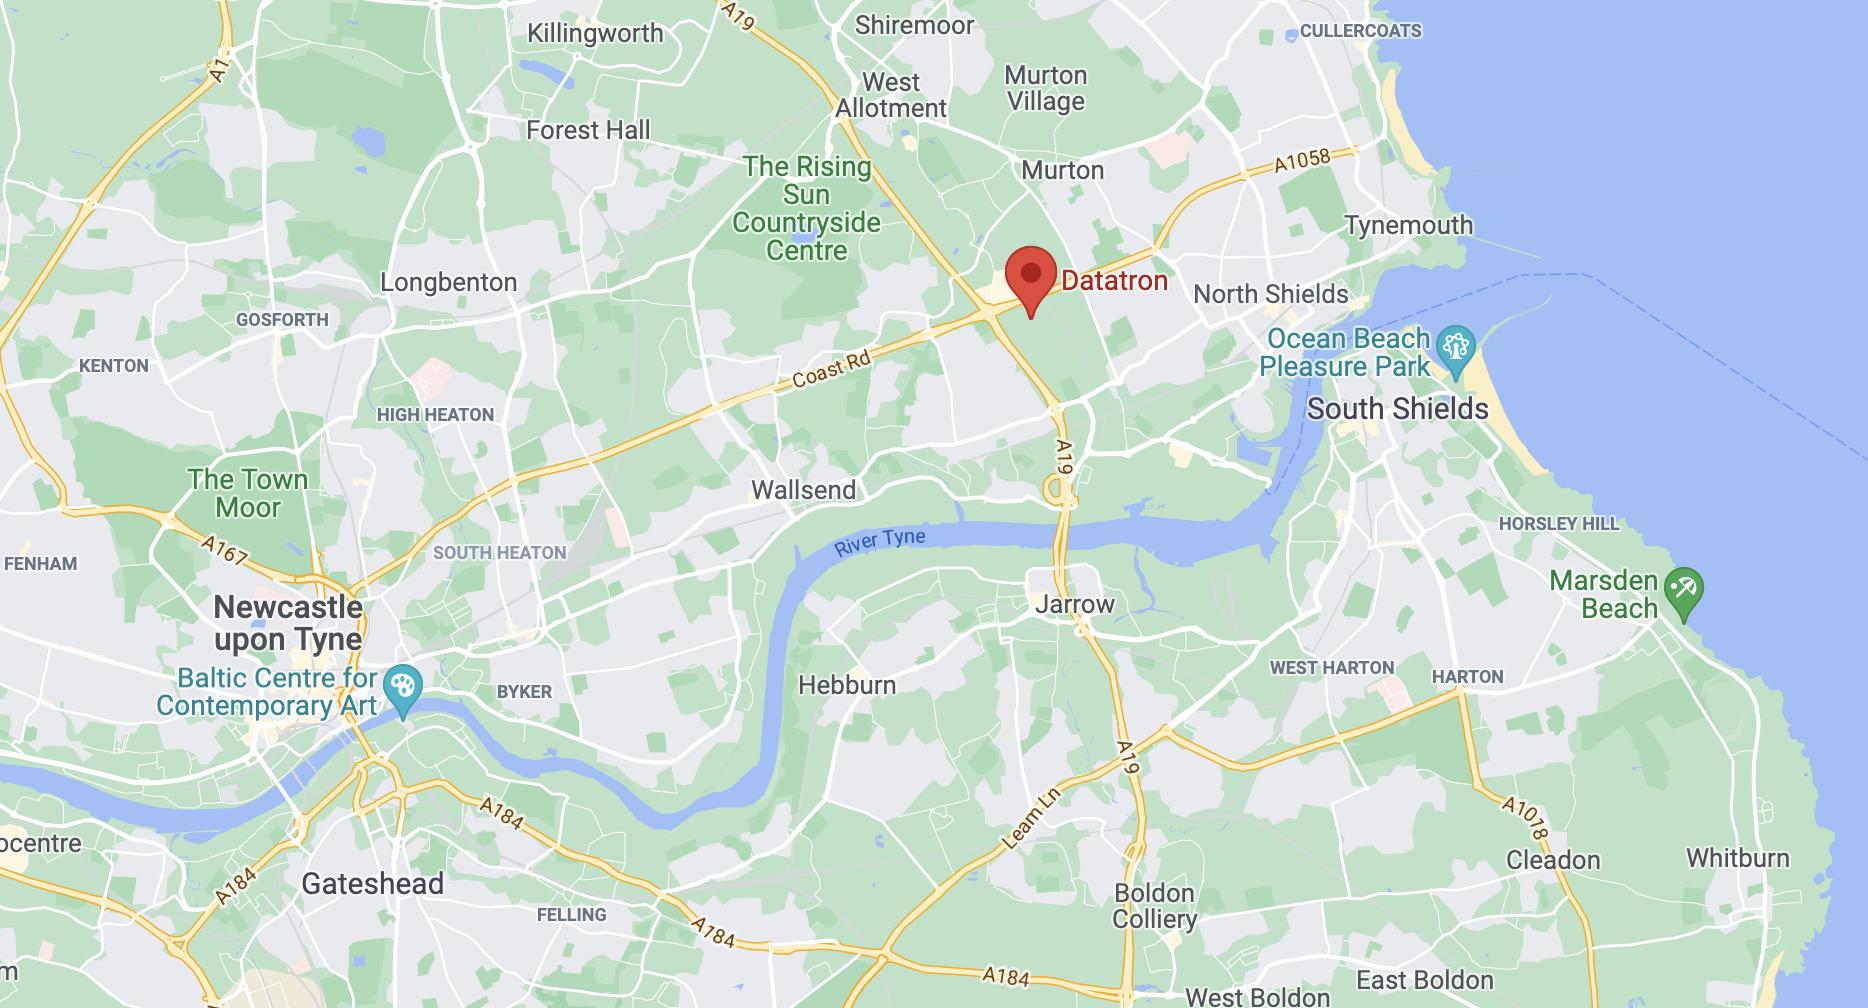 Datatron map location